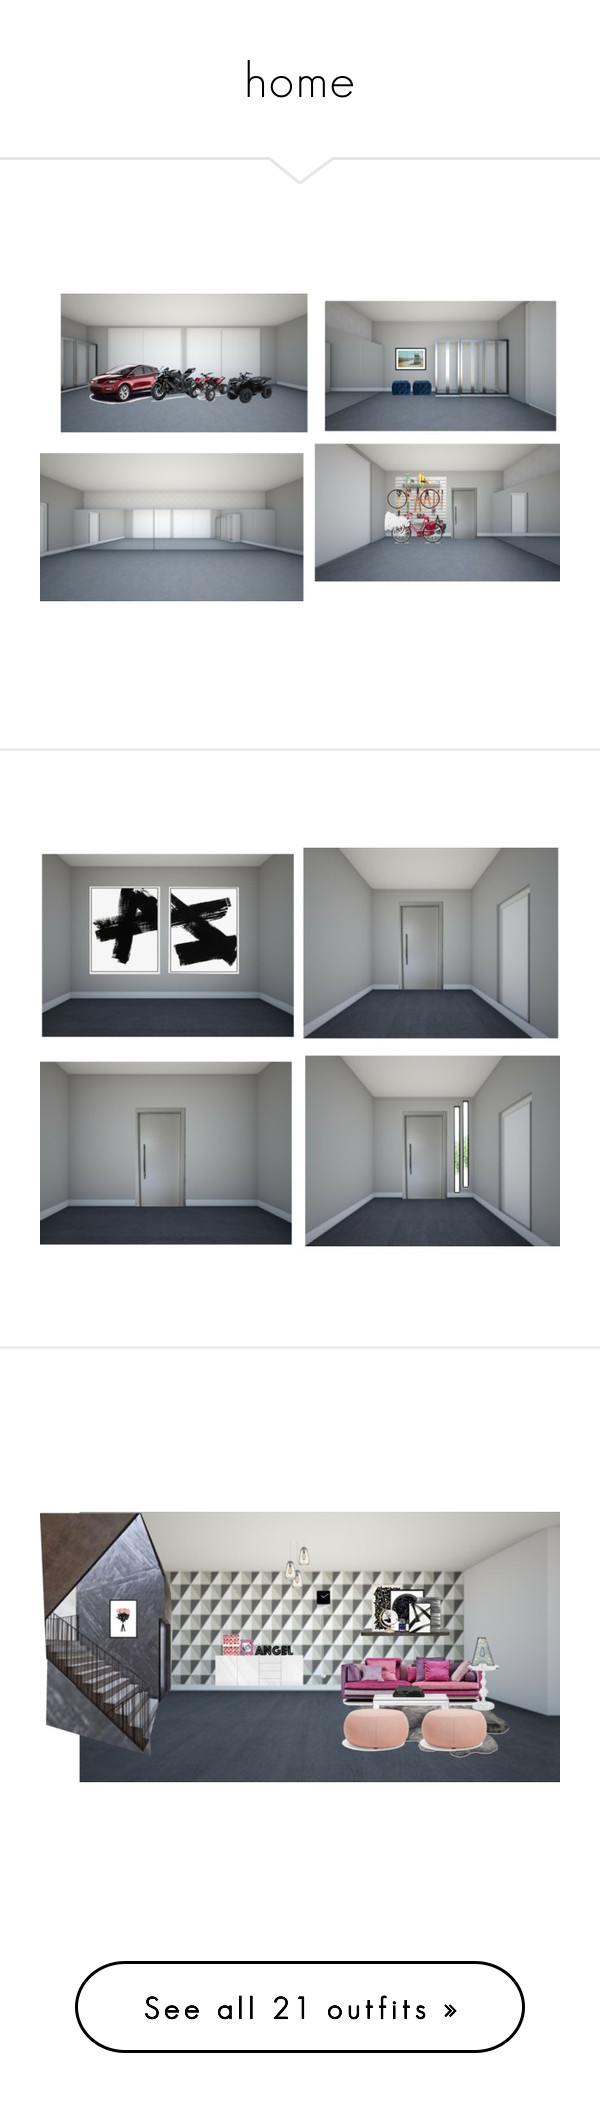 """home"" by paradapermitida on Polyvore featuring moda, Safavieh, WALL, Kawasaki, Gucci, interior, interiors, interior design, casa e home decor"